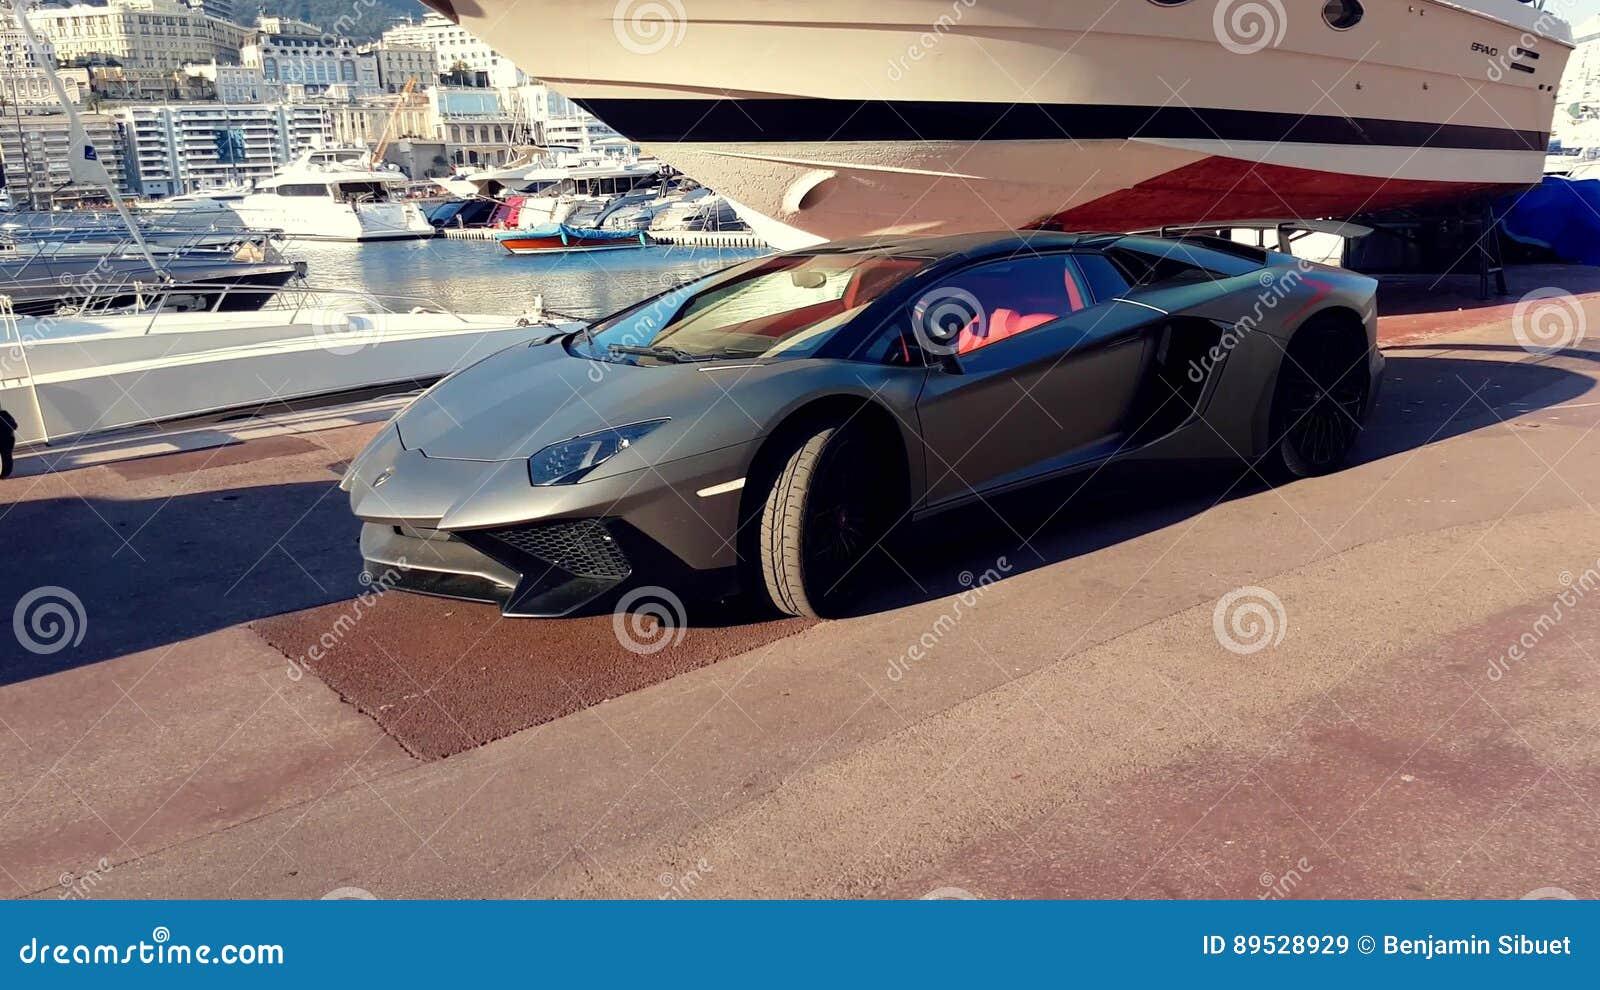 Luxury Lifestyle In Monaco Stock Video Video Of Boats 89528929